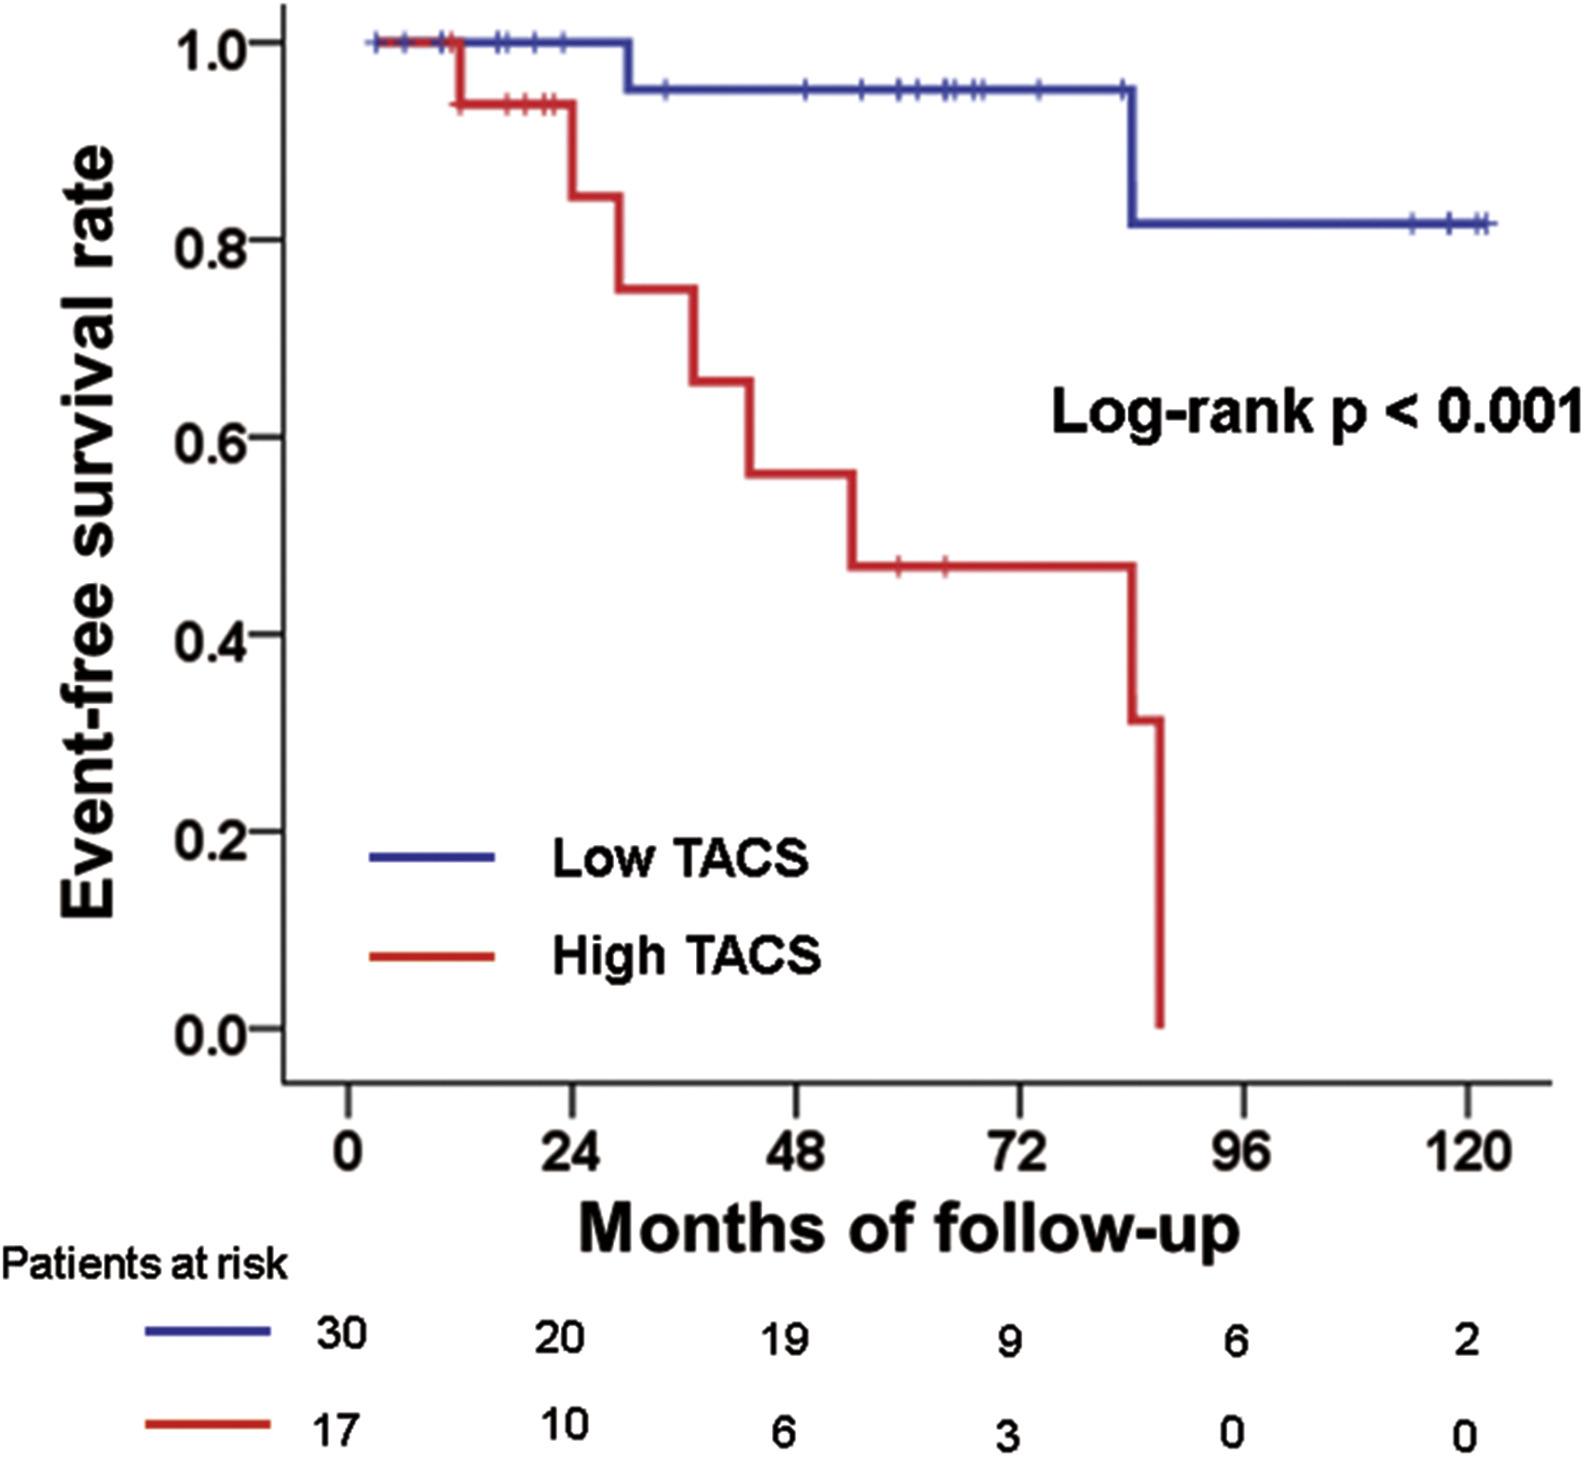 Association Of Thoracic Aorta Calcium Score With Left